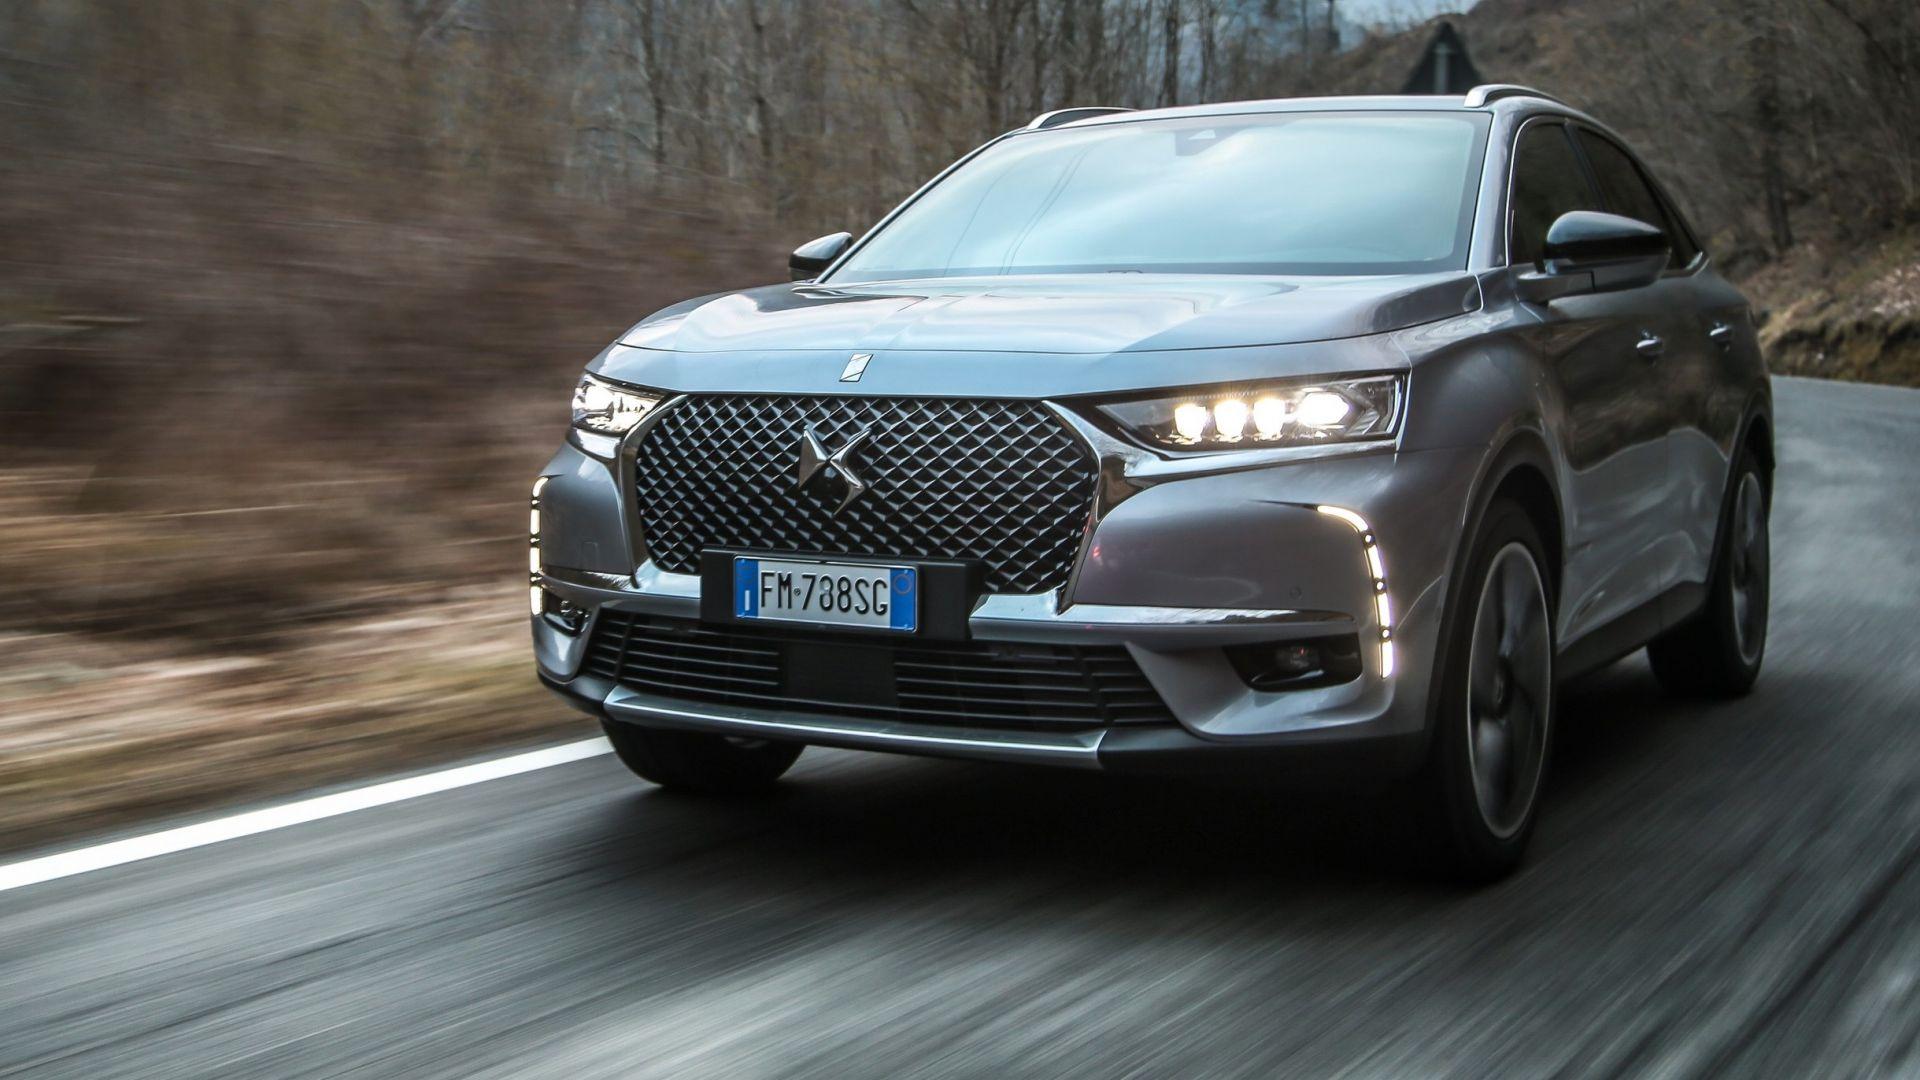 nuova ds 7 crossback 2018  prova su strada  motori  interni  prezzi